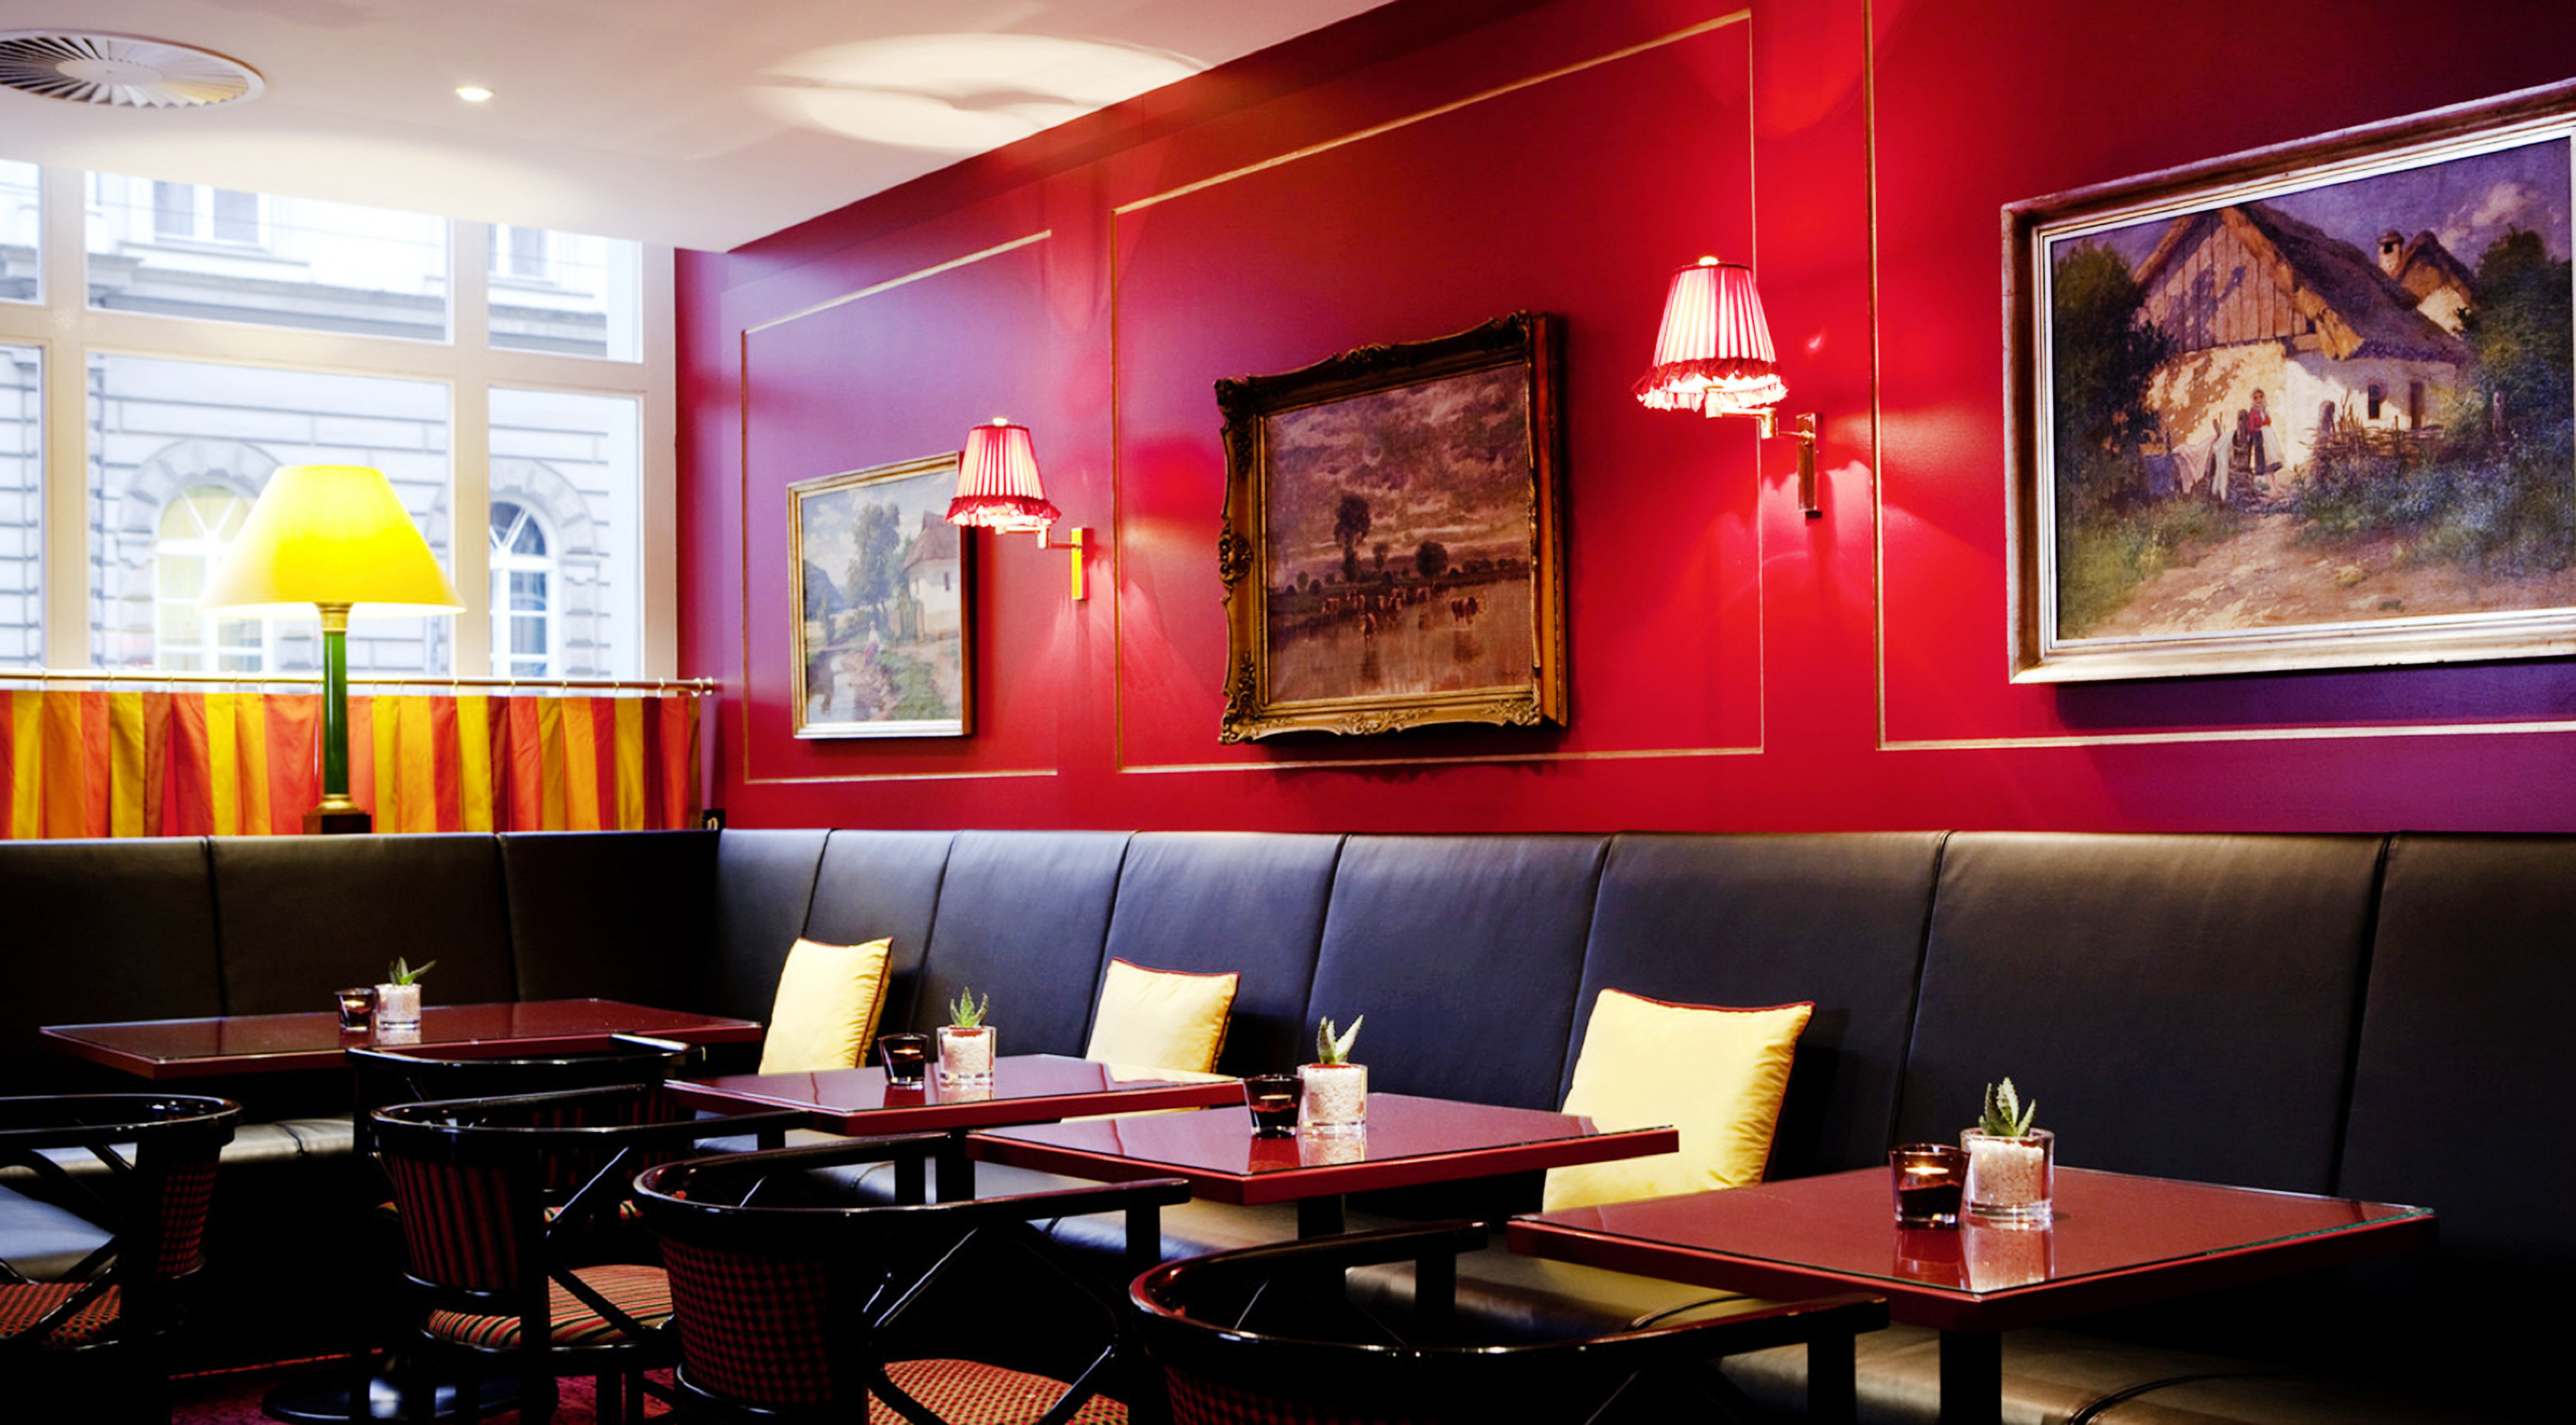 Classic Lounge Luxury Romantic red restaurant Bar